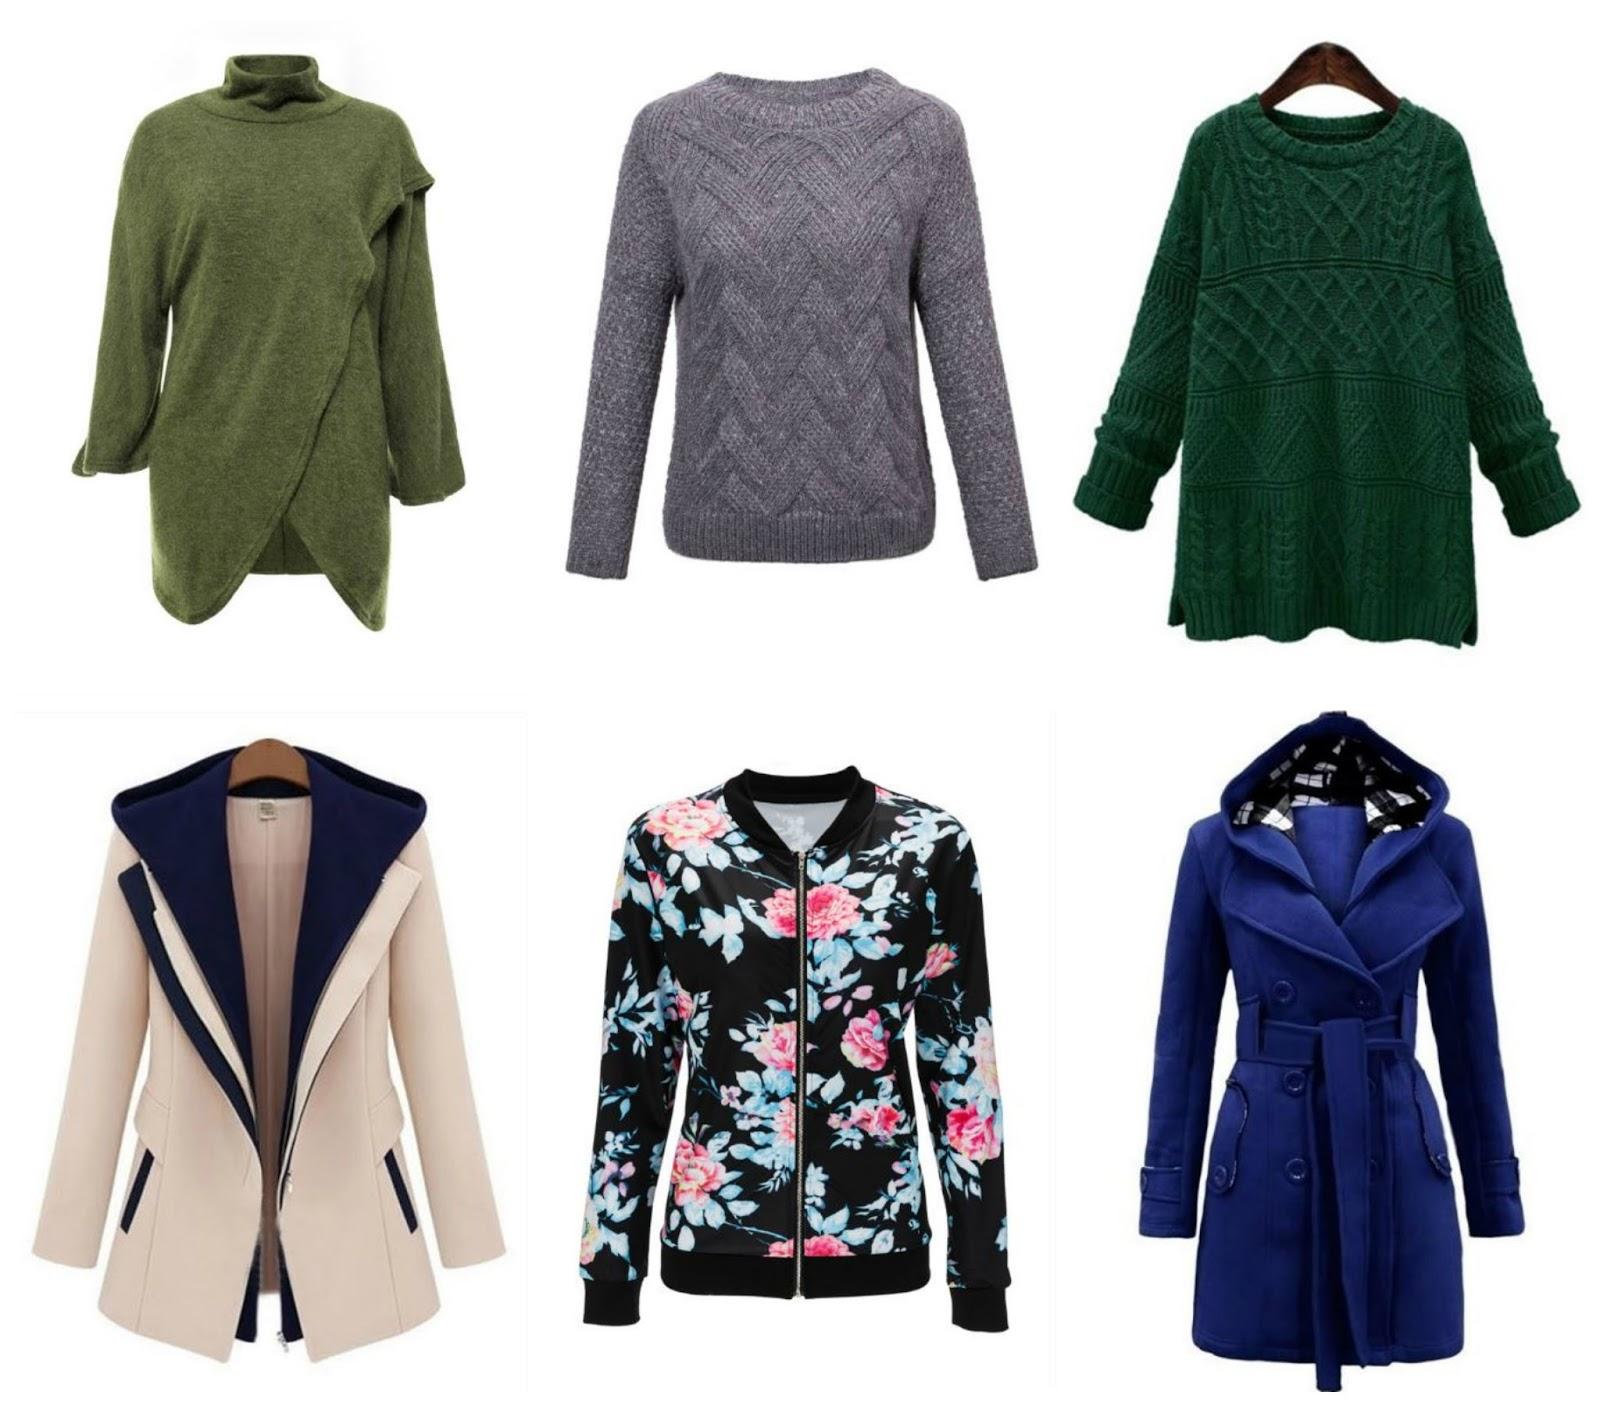 Rebecca Lately Fall Fashion Cute Sweaters Fashion Outerwear